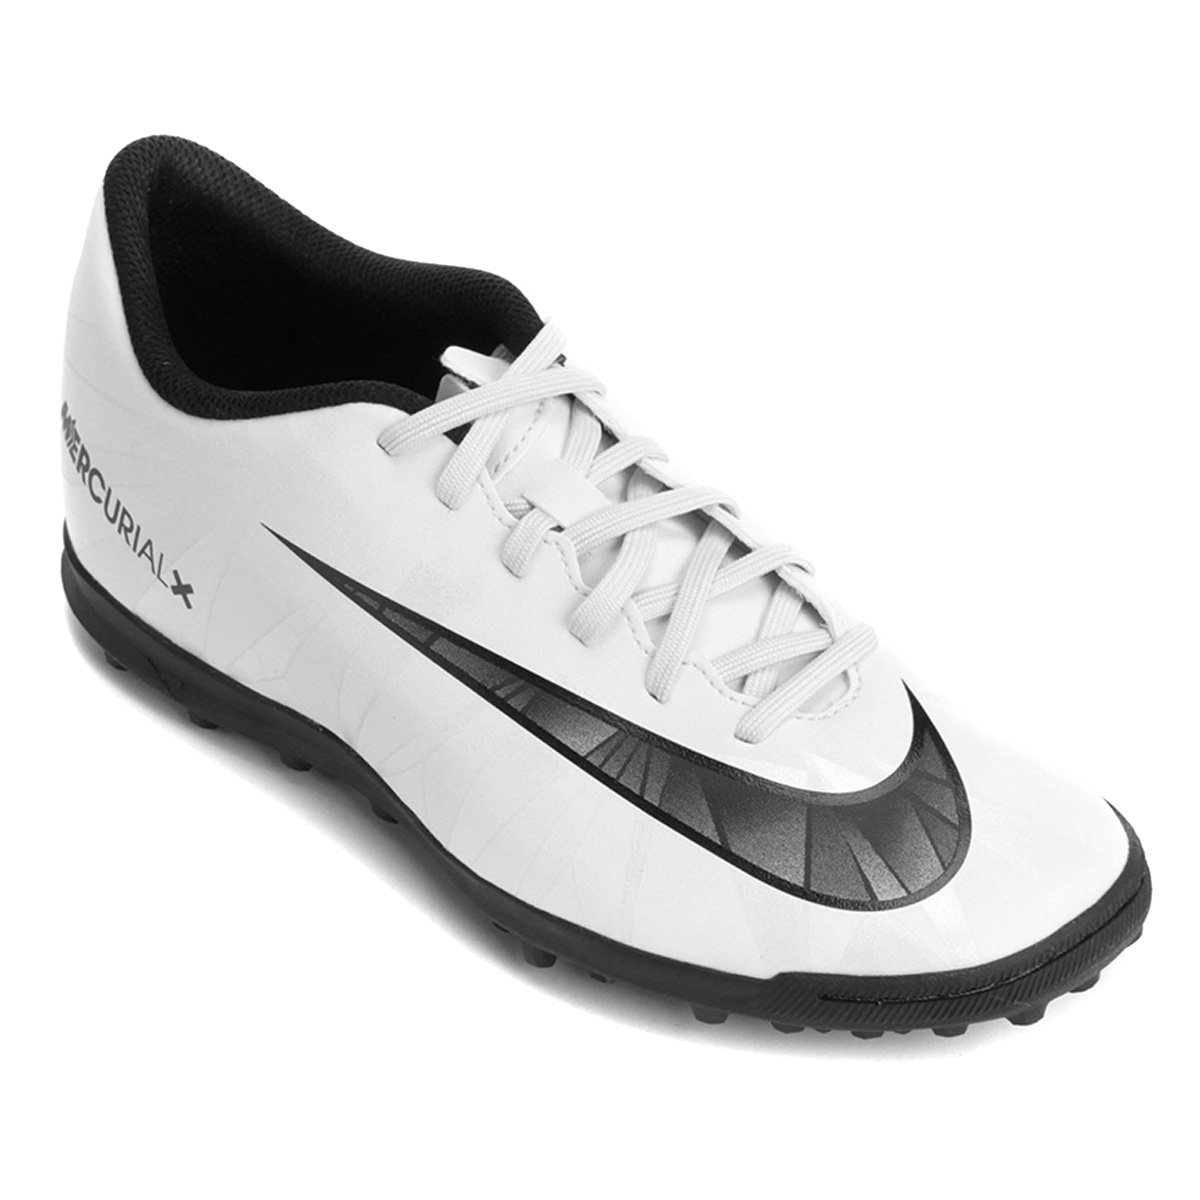 6cb2bab300 Chuteira Society Nike Mercurial X Vortex 3 CR7 TF - Compre Agora ...